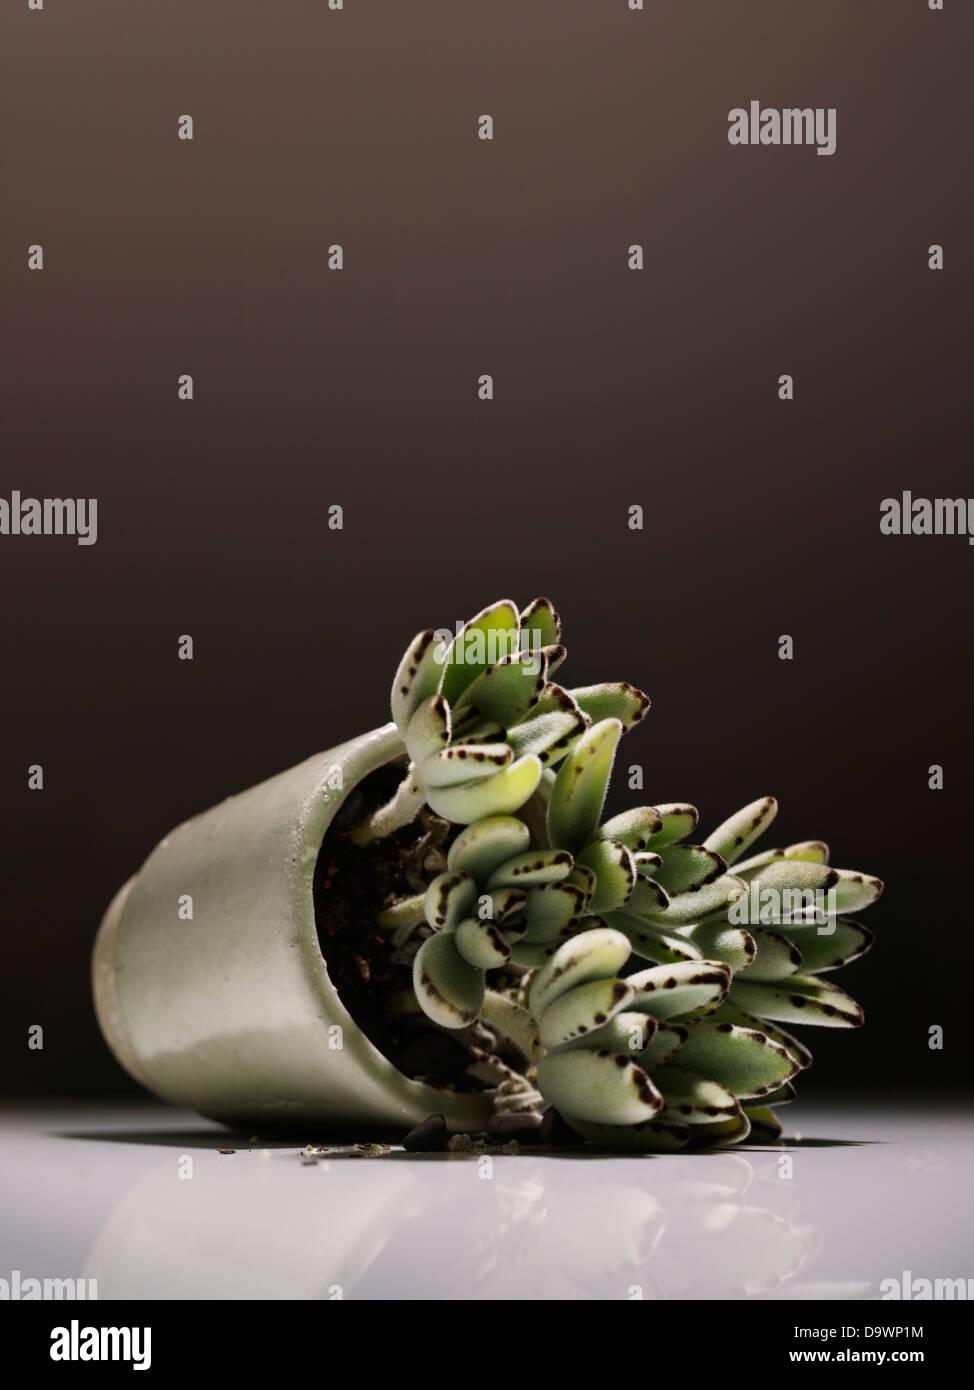 Plante Photo Stock